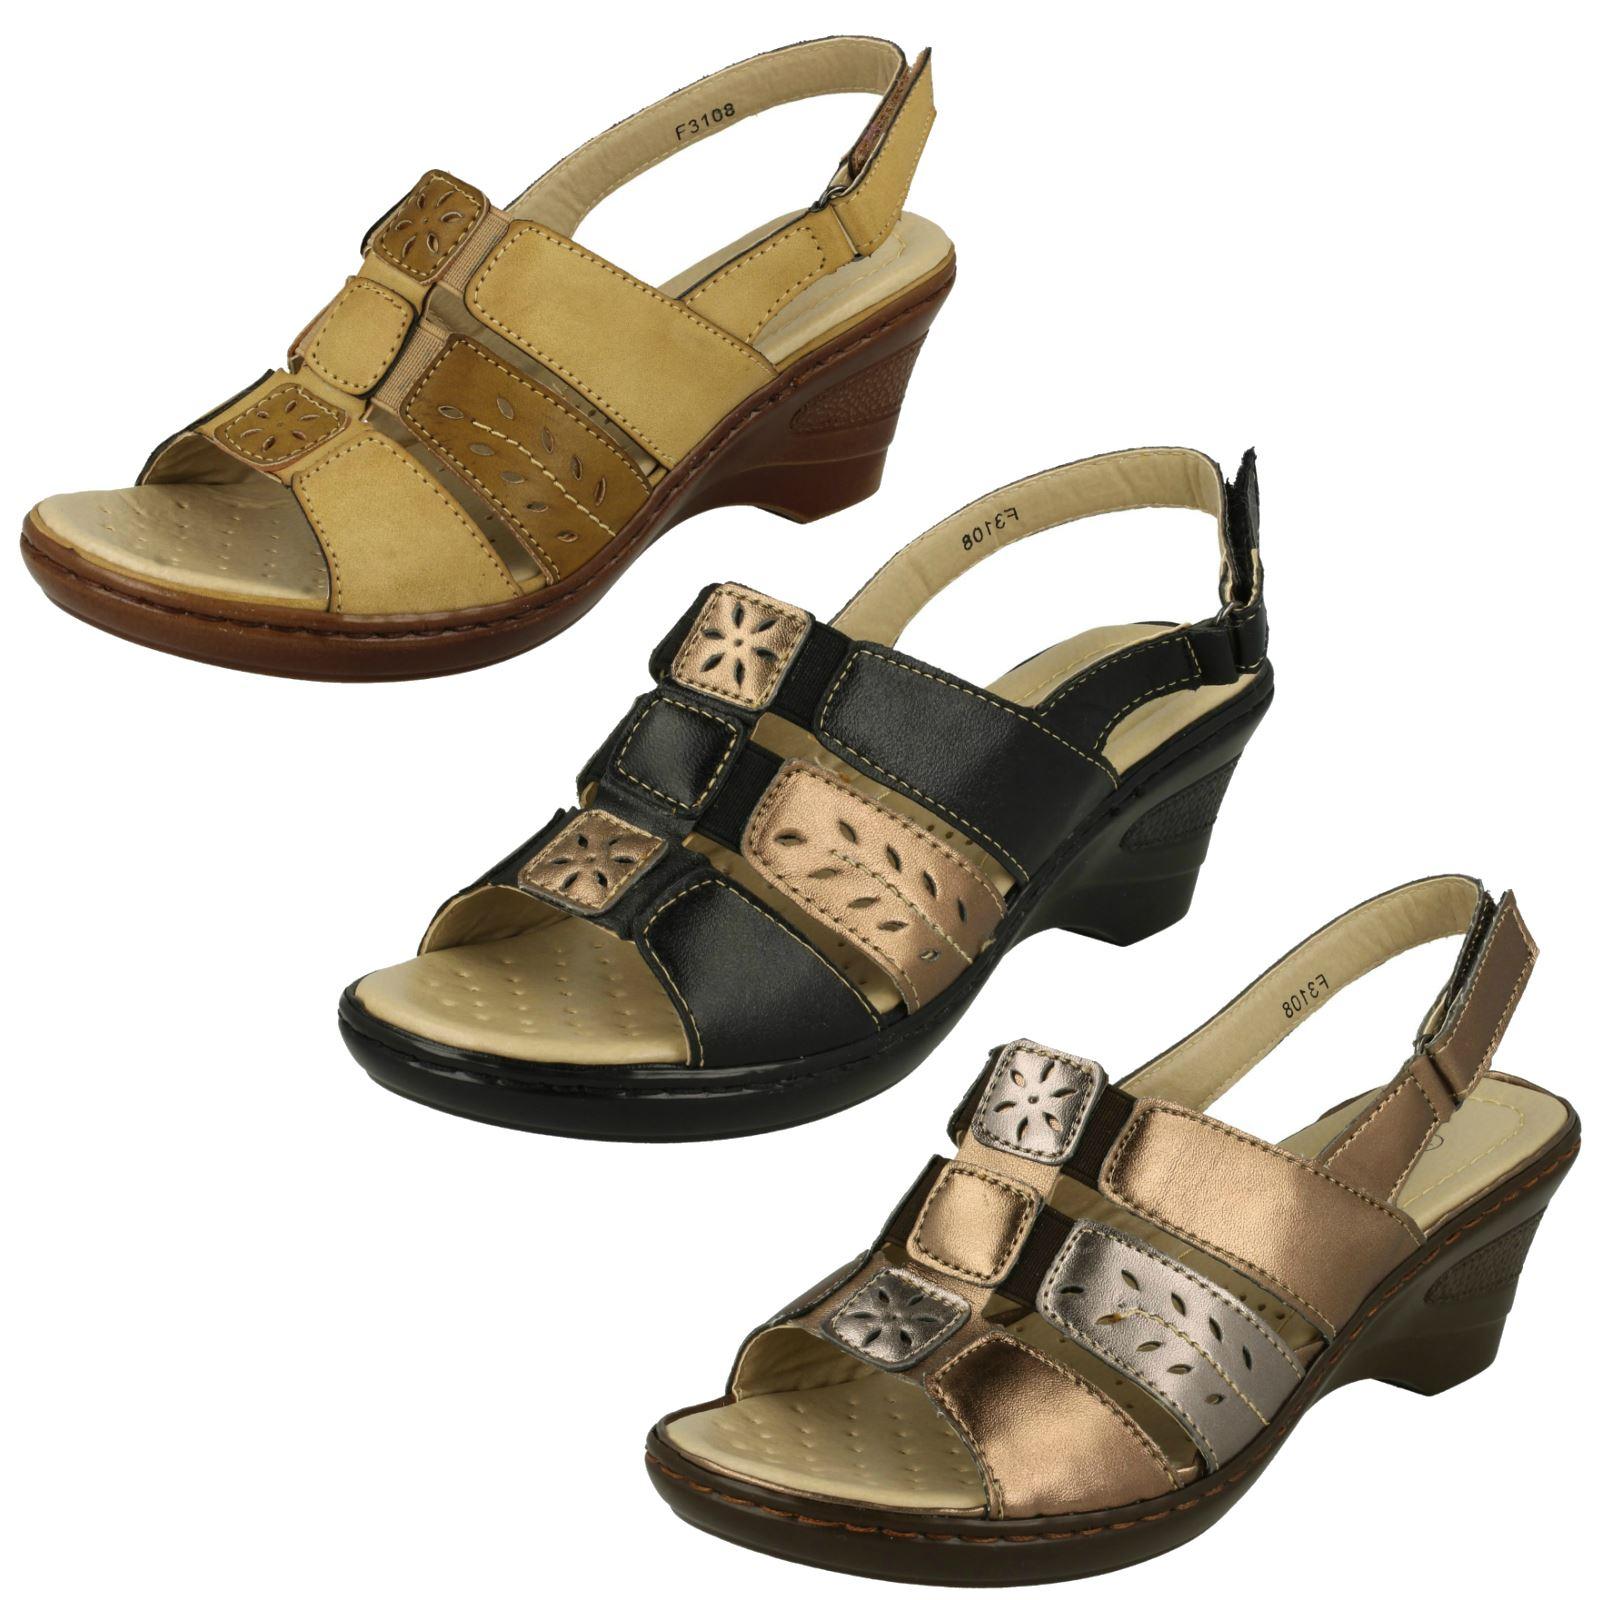 Ladies EAZE Casual Cinturino Sandali con Tacco